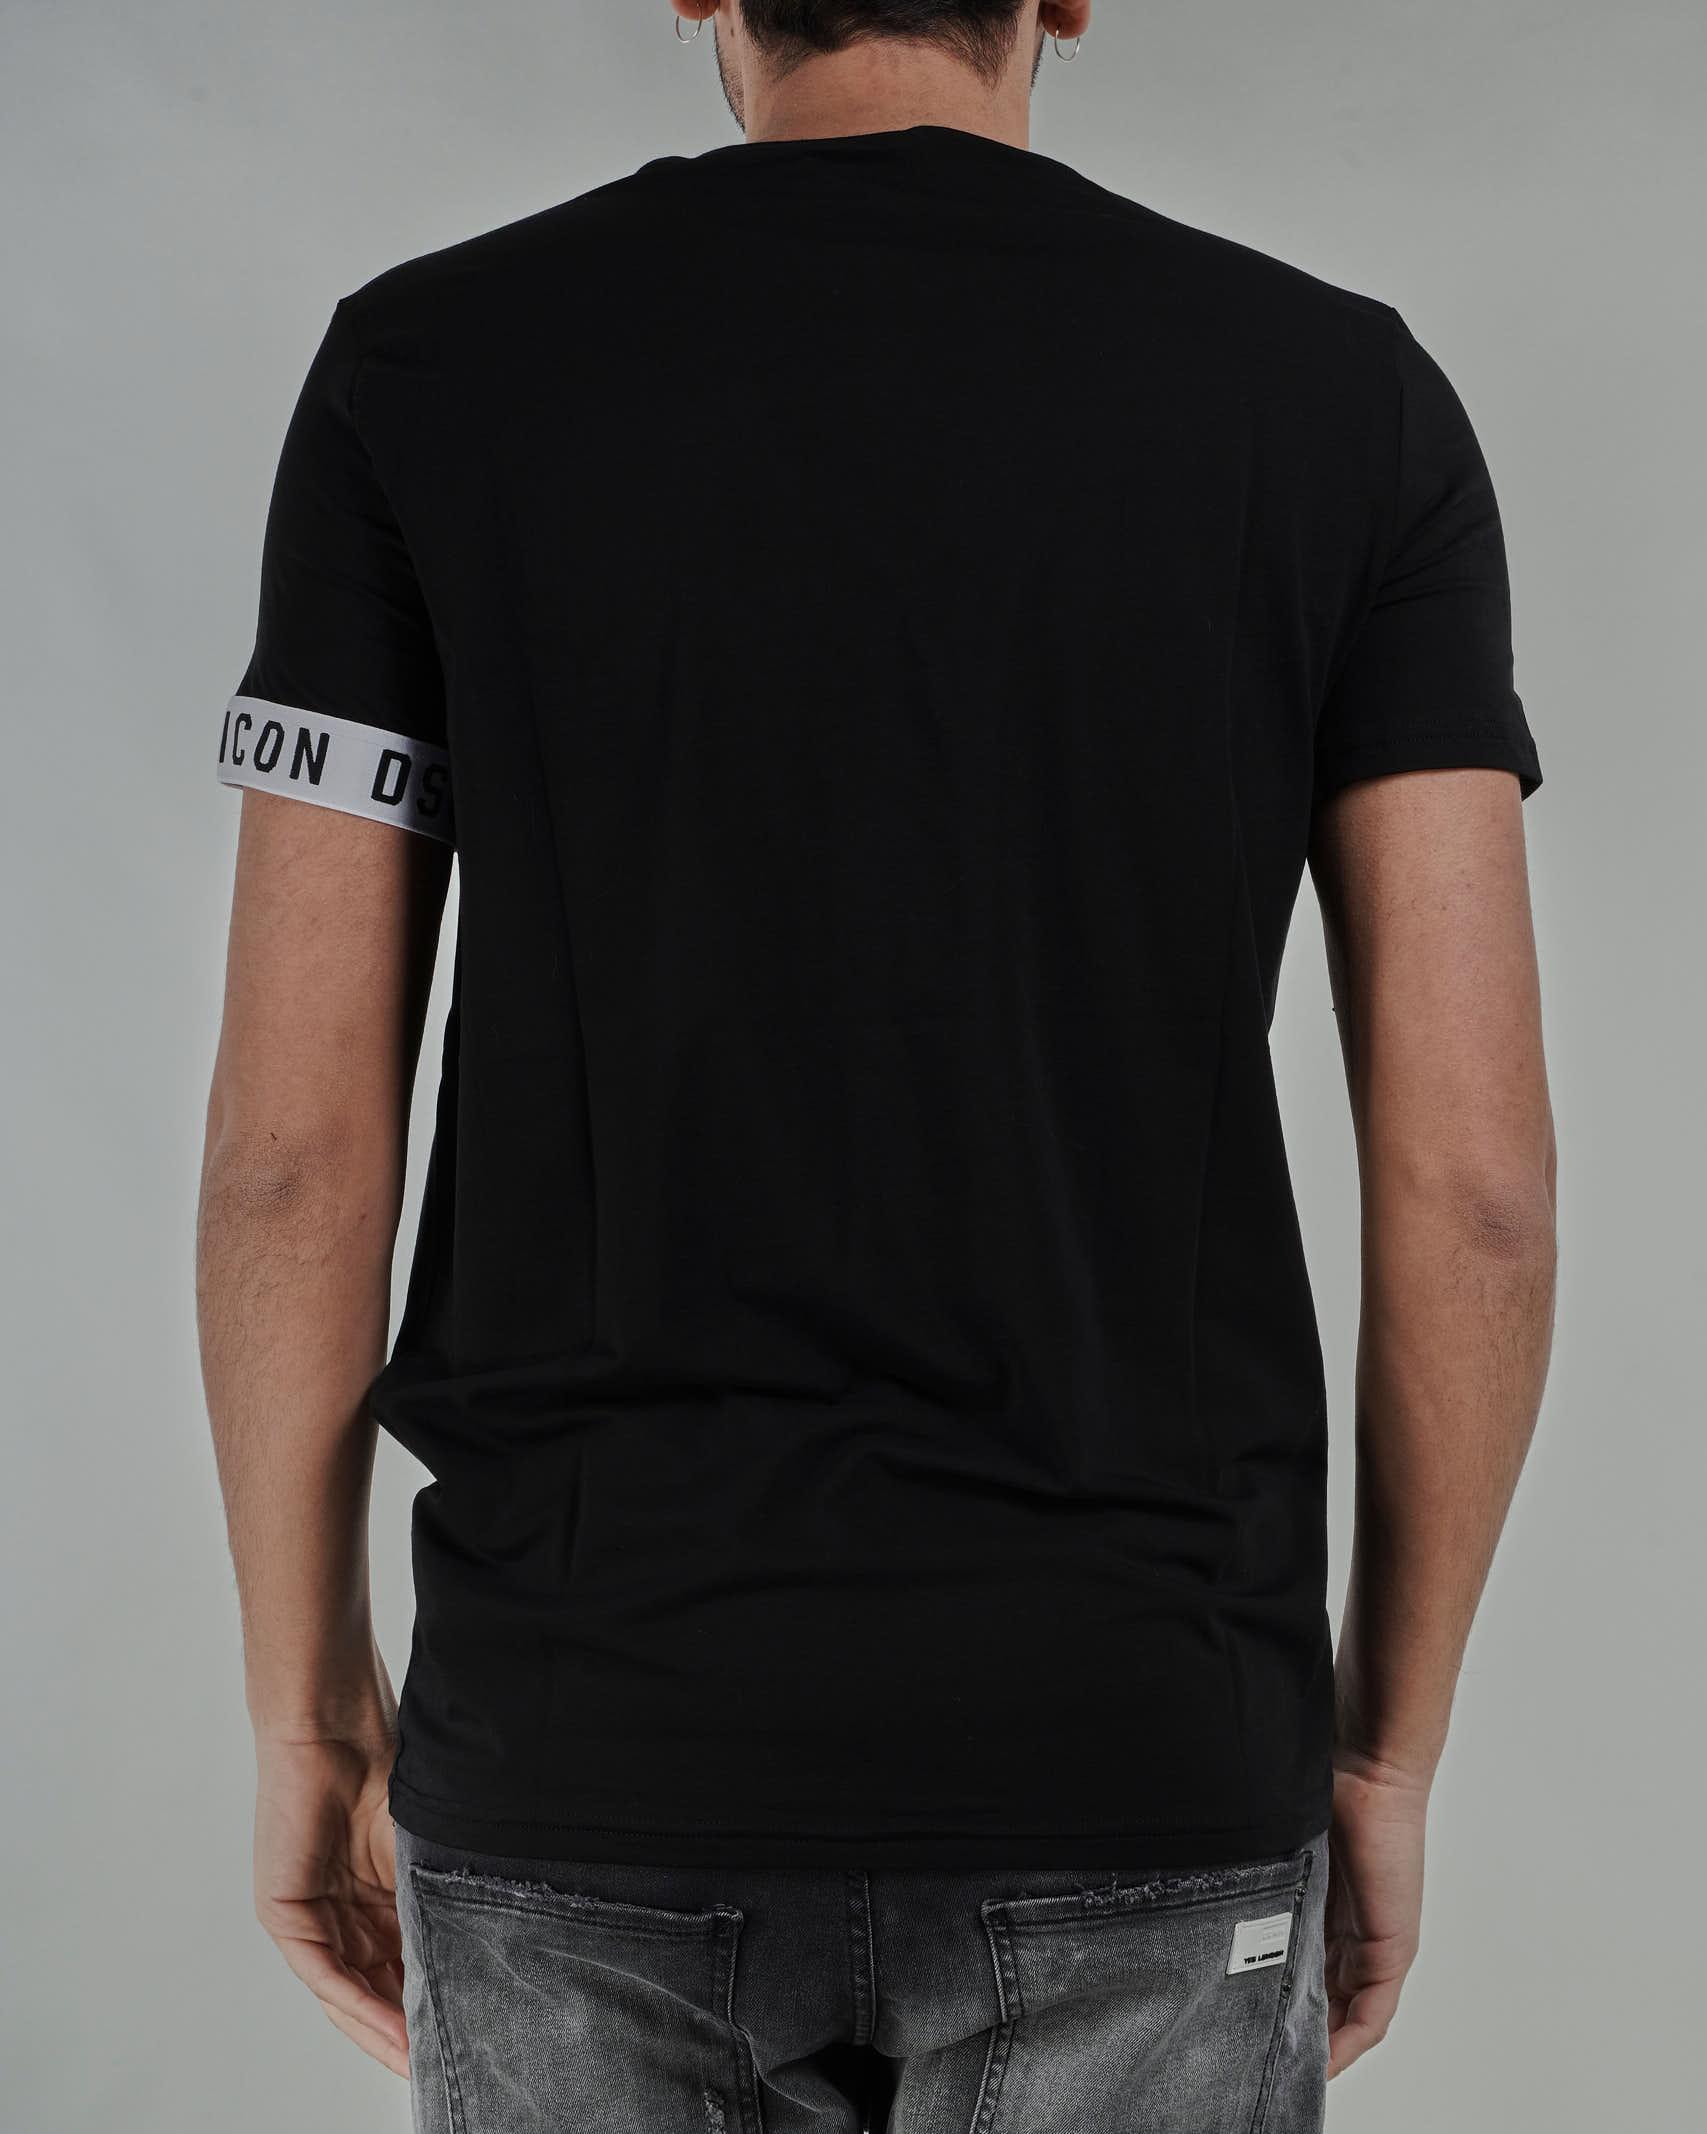 T-shirt con logo sulla manica DSQ2 Dsquared DSQUARED | T-shirt | D9M3S345010